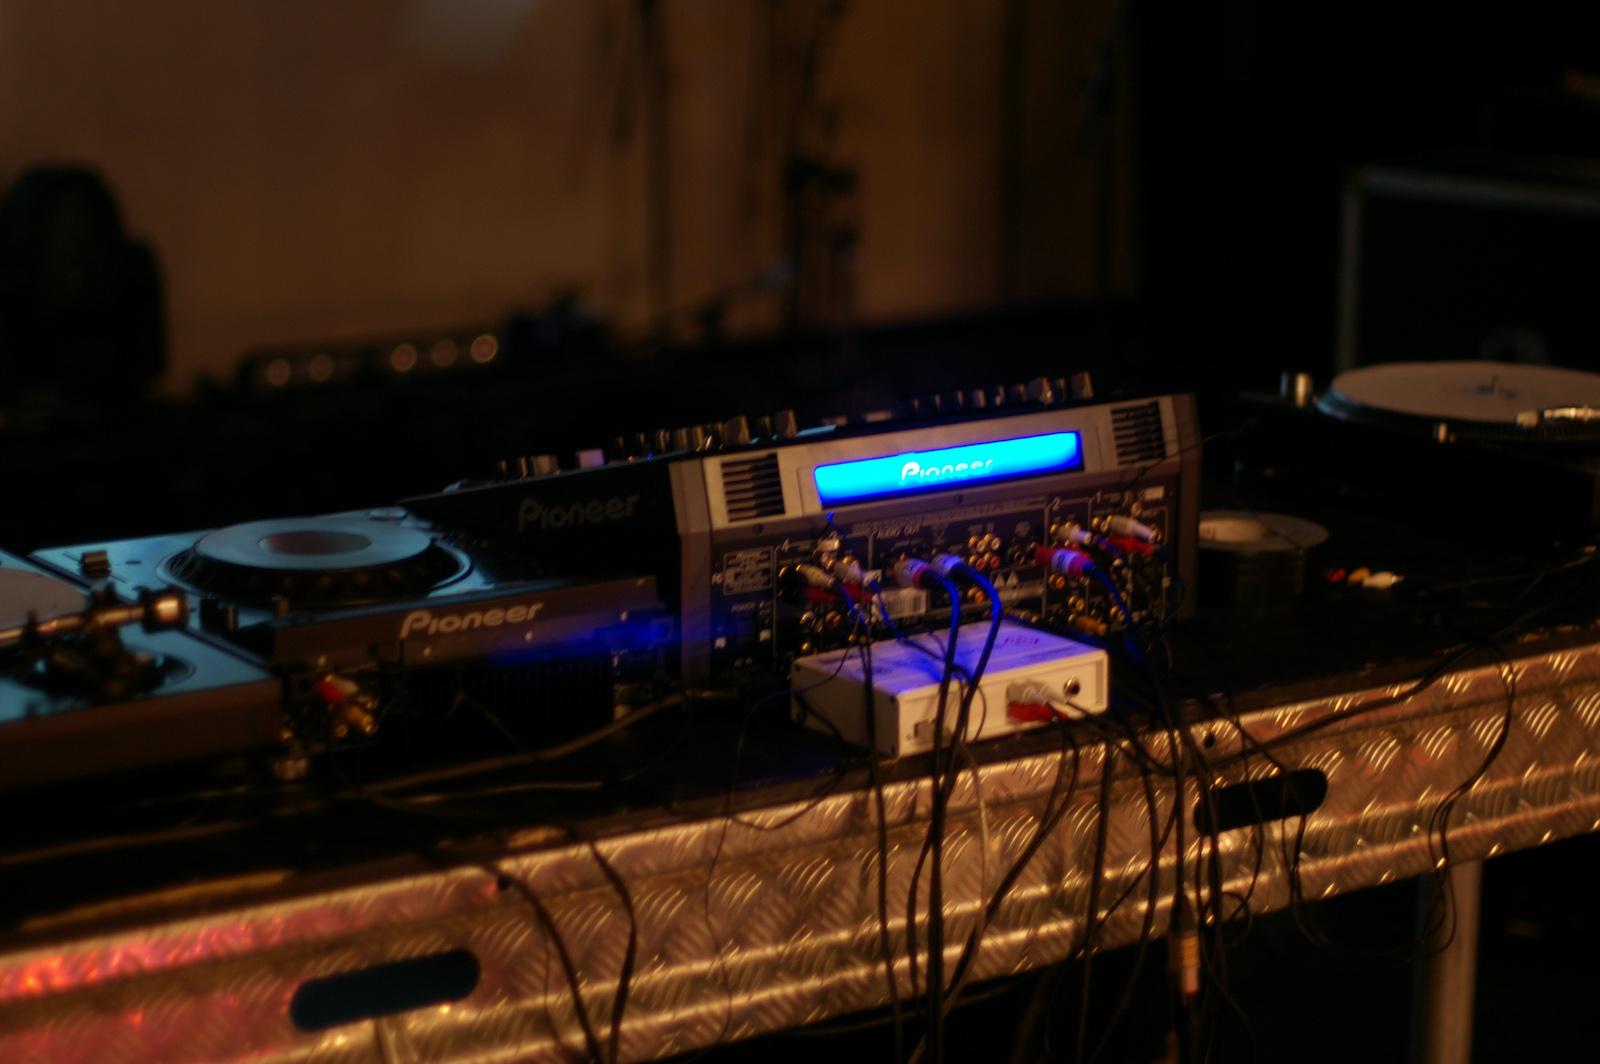 File:Pioneer SVM-1000 DVJ mixer (rear) jpg - Wikimedia Commons